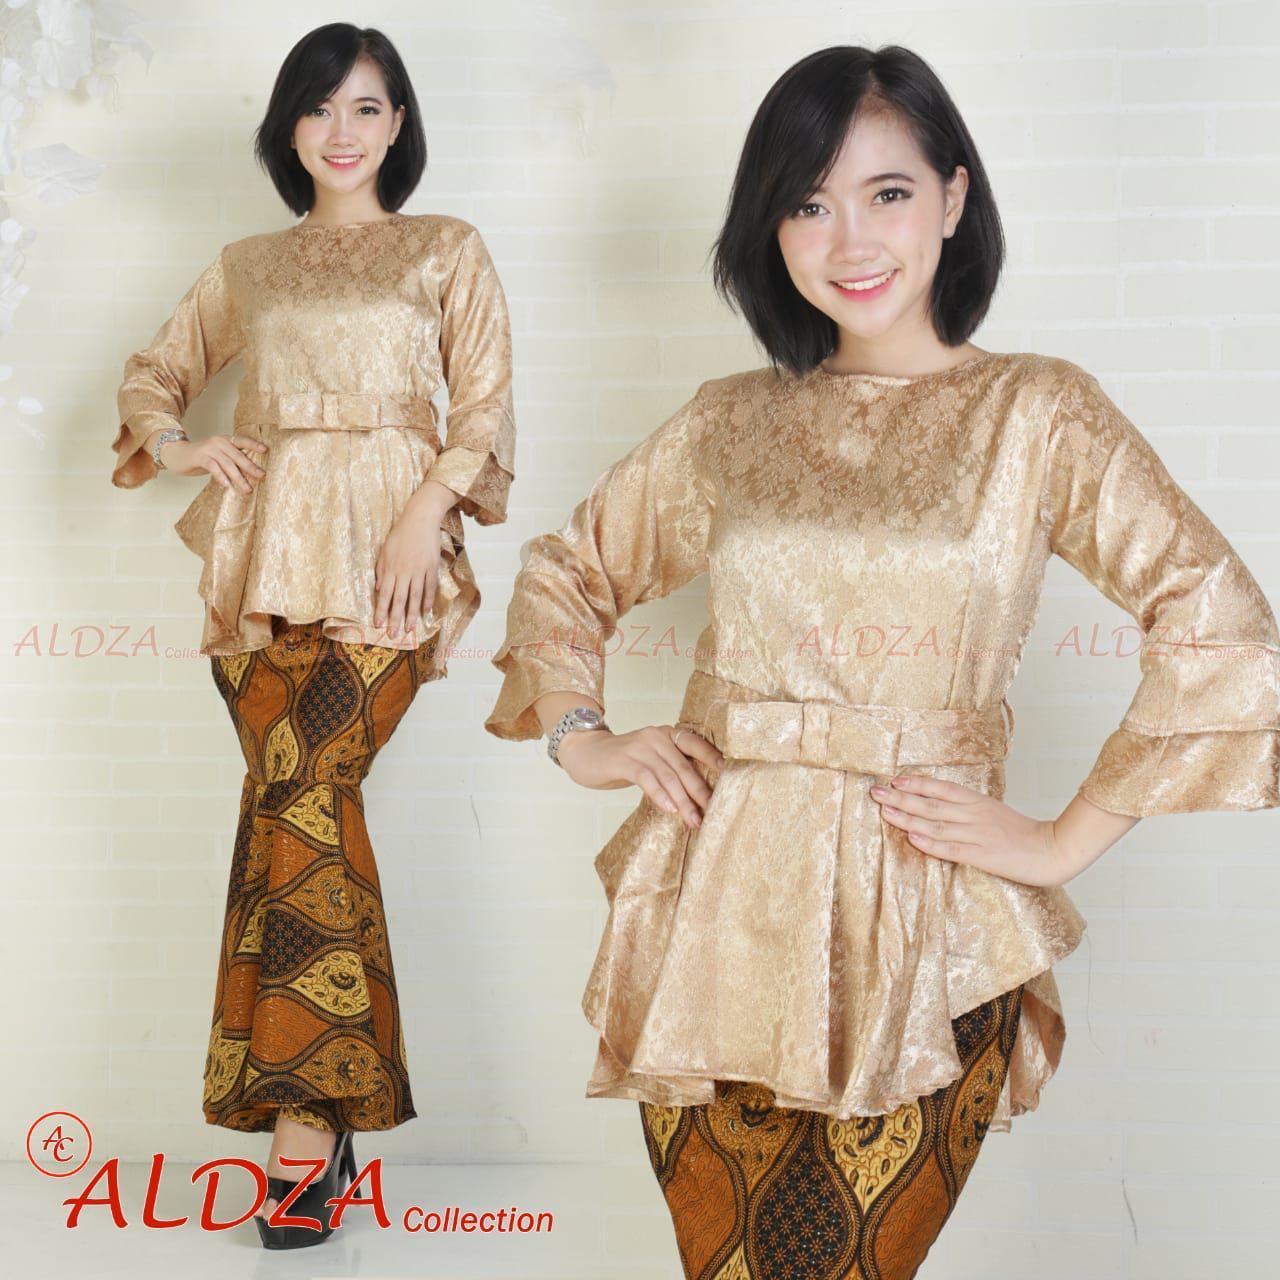 Setelan baju batik kebaya wanita/fahsion wanitakebaya muslim /kebaya modern/kebaya tradisionalkebaya keluarga/kebaya wisuda/kebaya rok dunyung terbaru